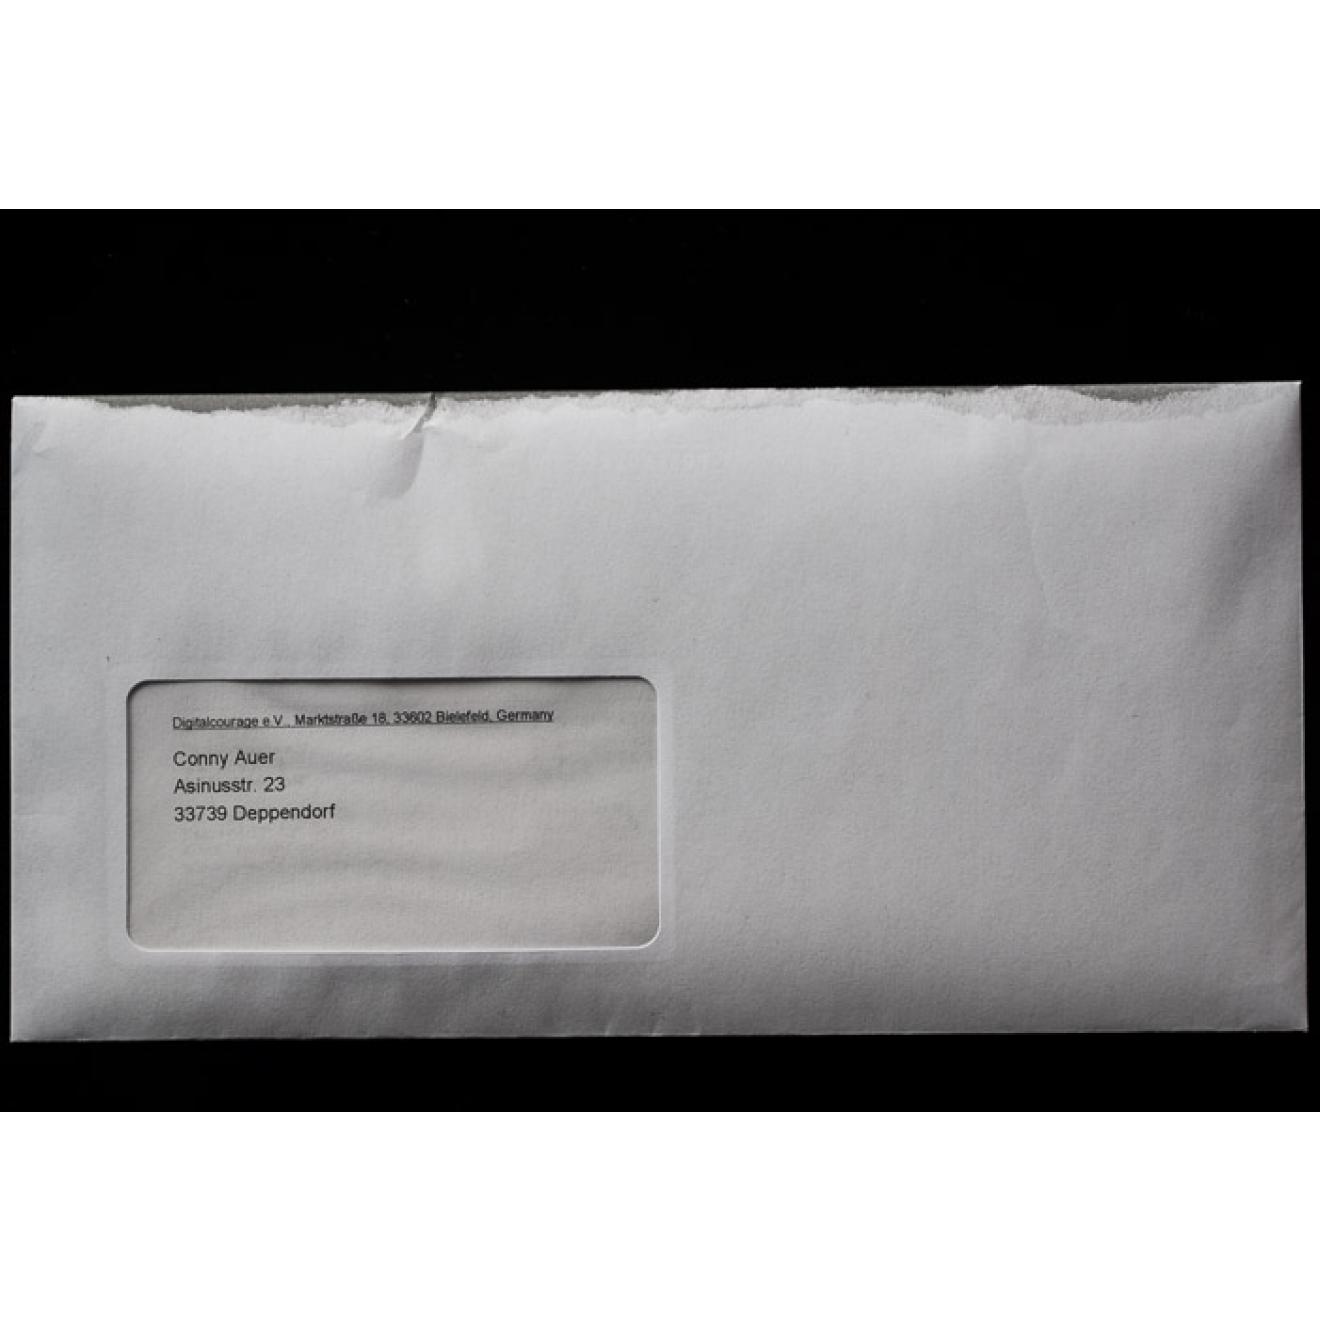 Briefumschlag Oops Geöffnet Din Lang Digitalcourage Ev